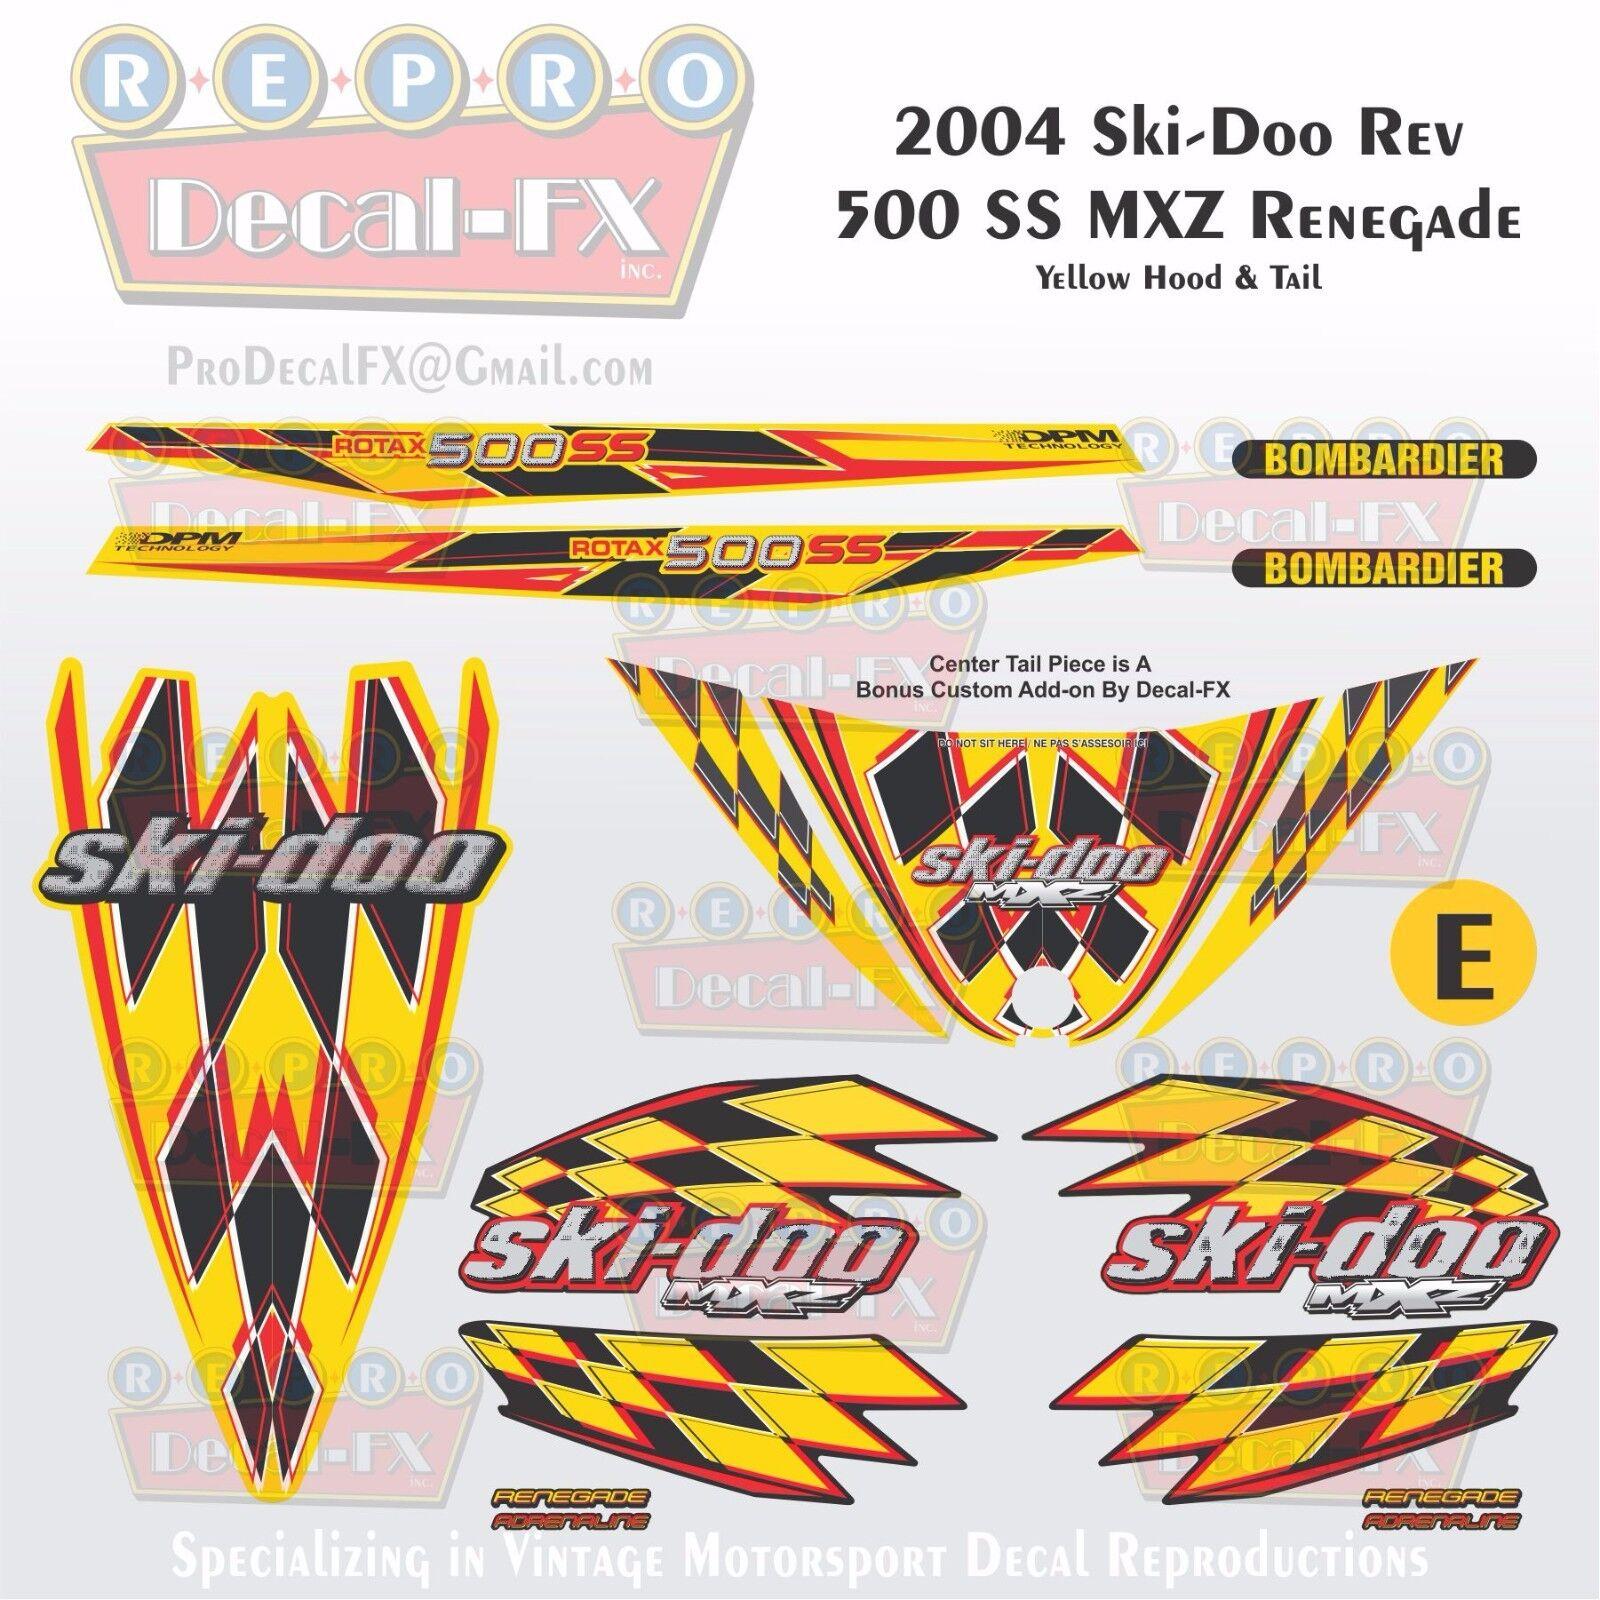 2004 Ski-doo MXZ500SS Yellow Hood & Tail Rev Reproduction Vinyl Decals16Pc DPM